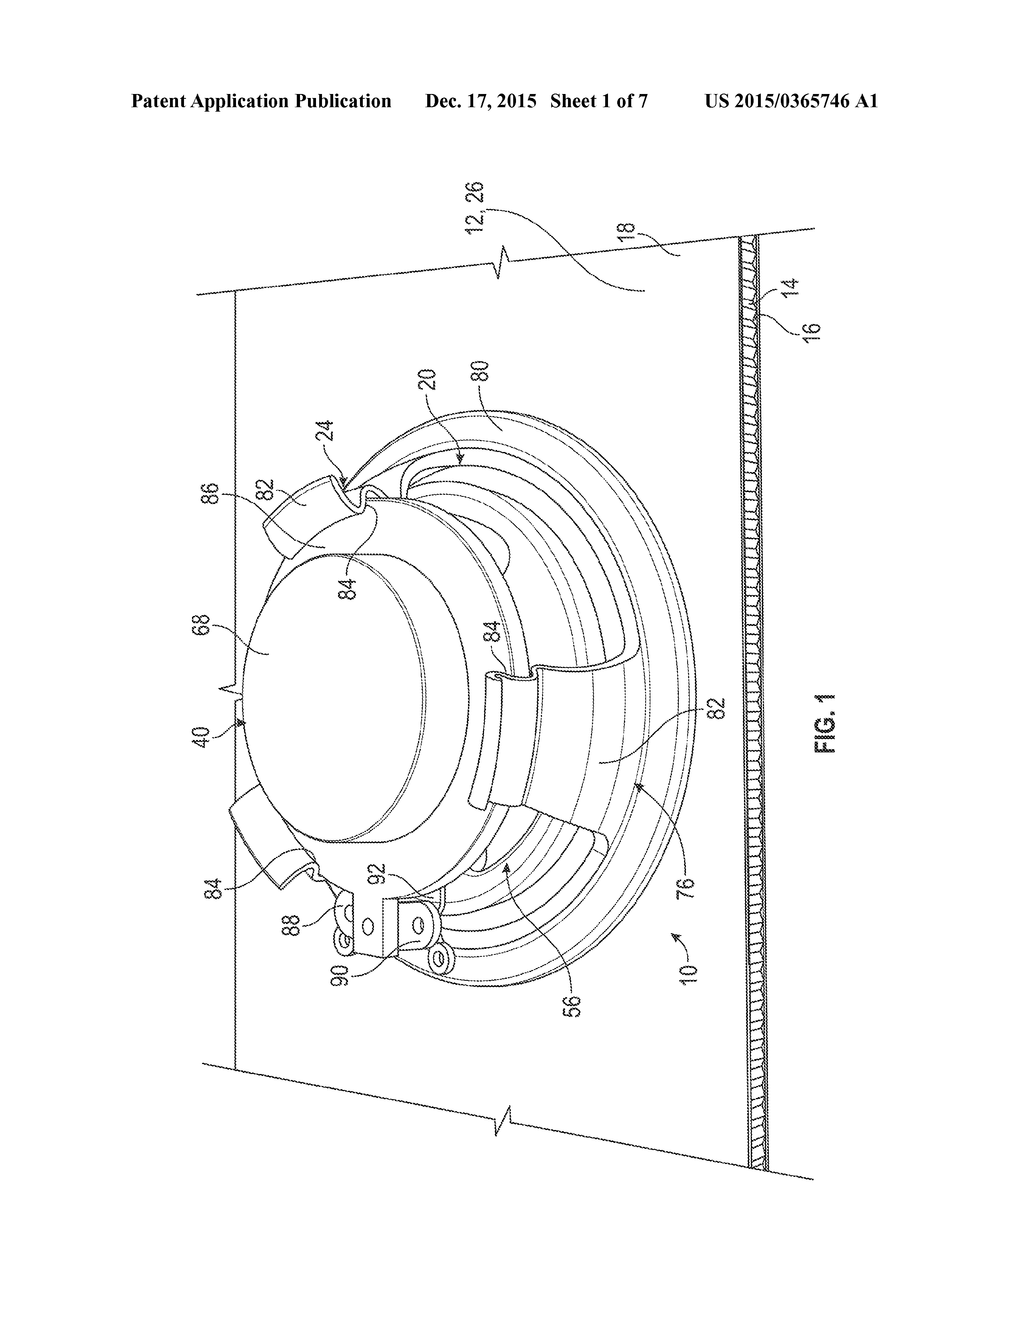 Beaufiful Loudspeaker Circuit Diagram Pictures Xsara Gain Amplifier Automotivecircuit Seekic Speaker Network Images Flat Panel System And Method Of Making